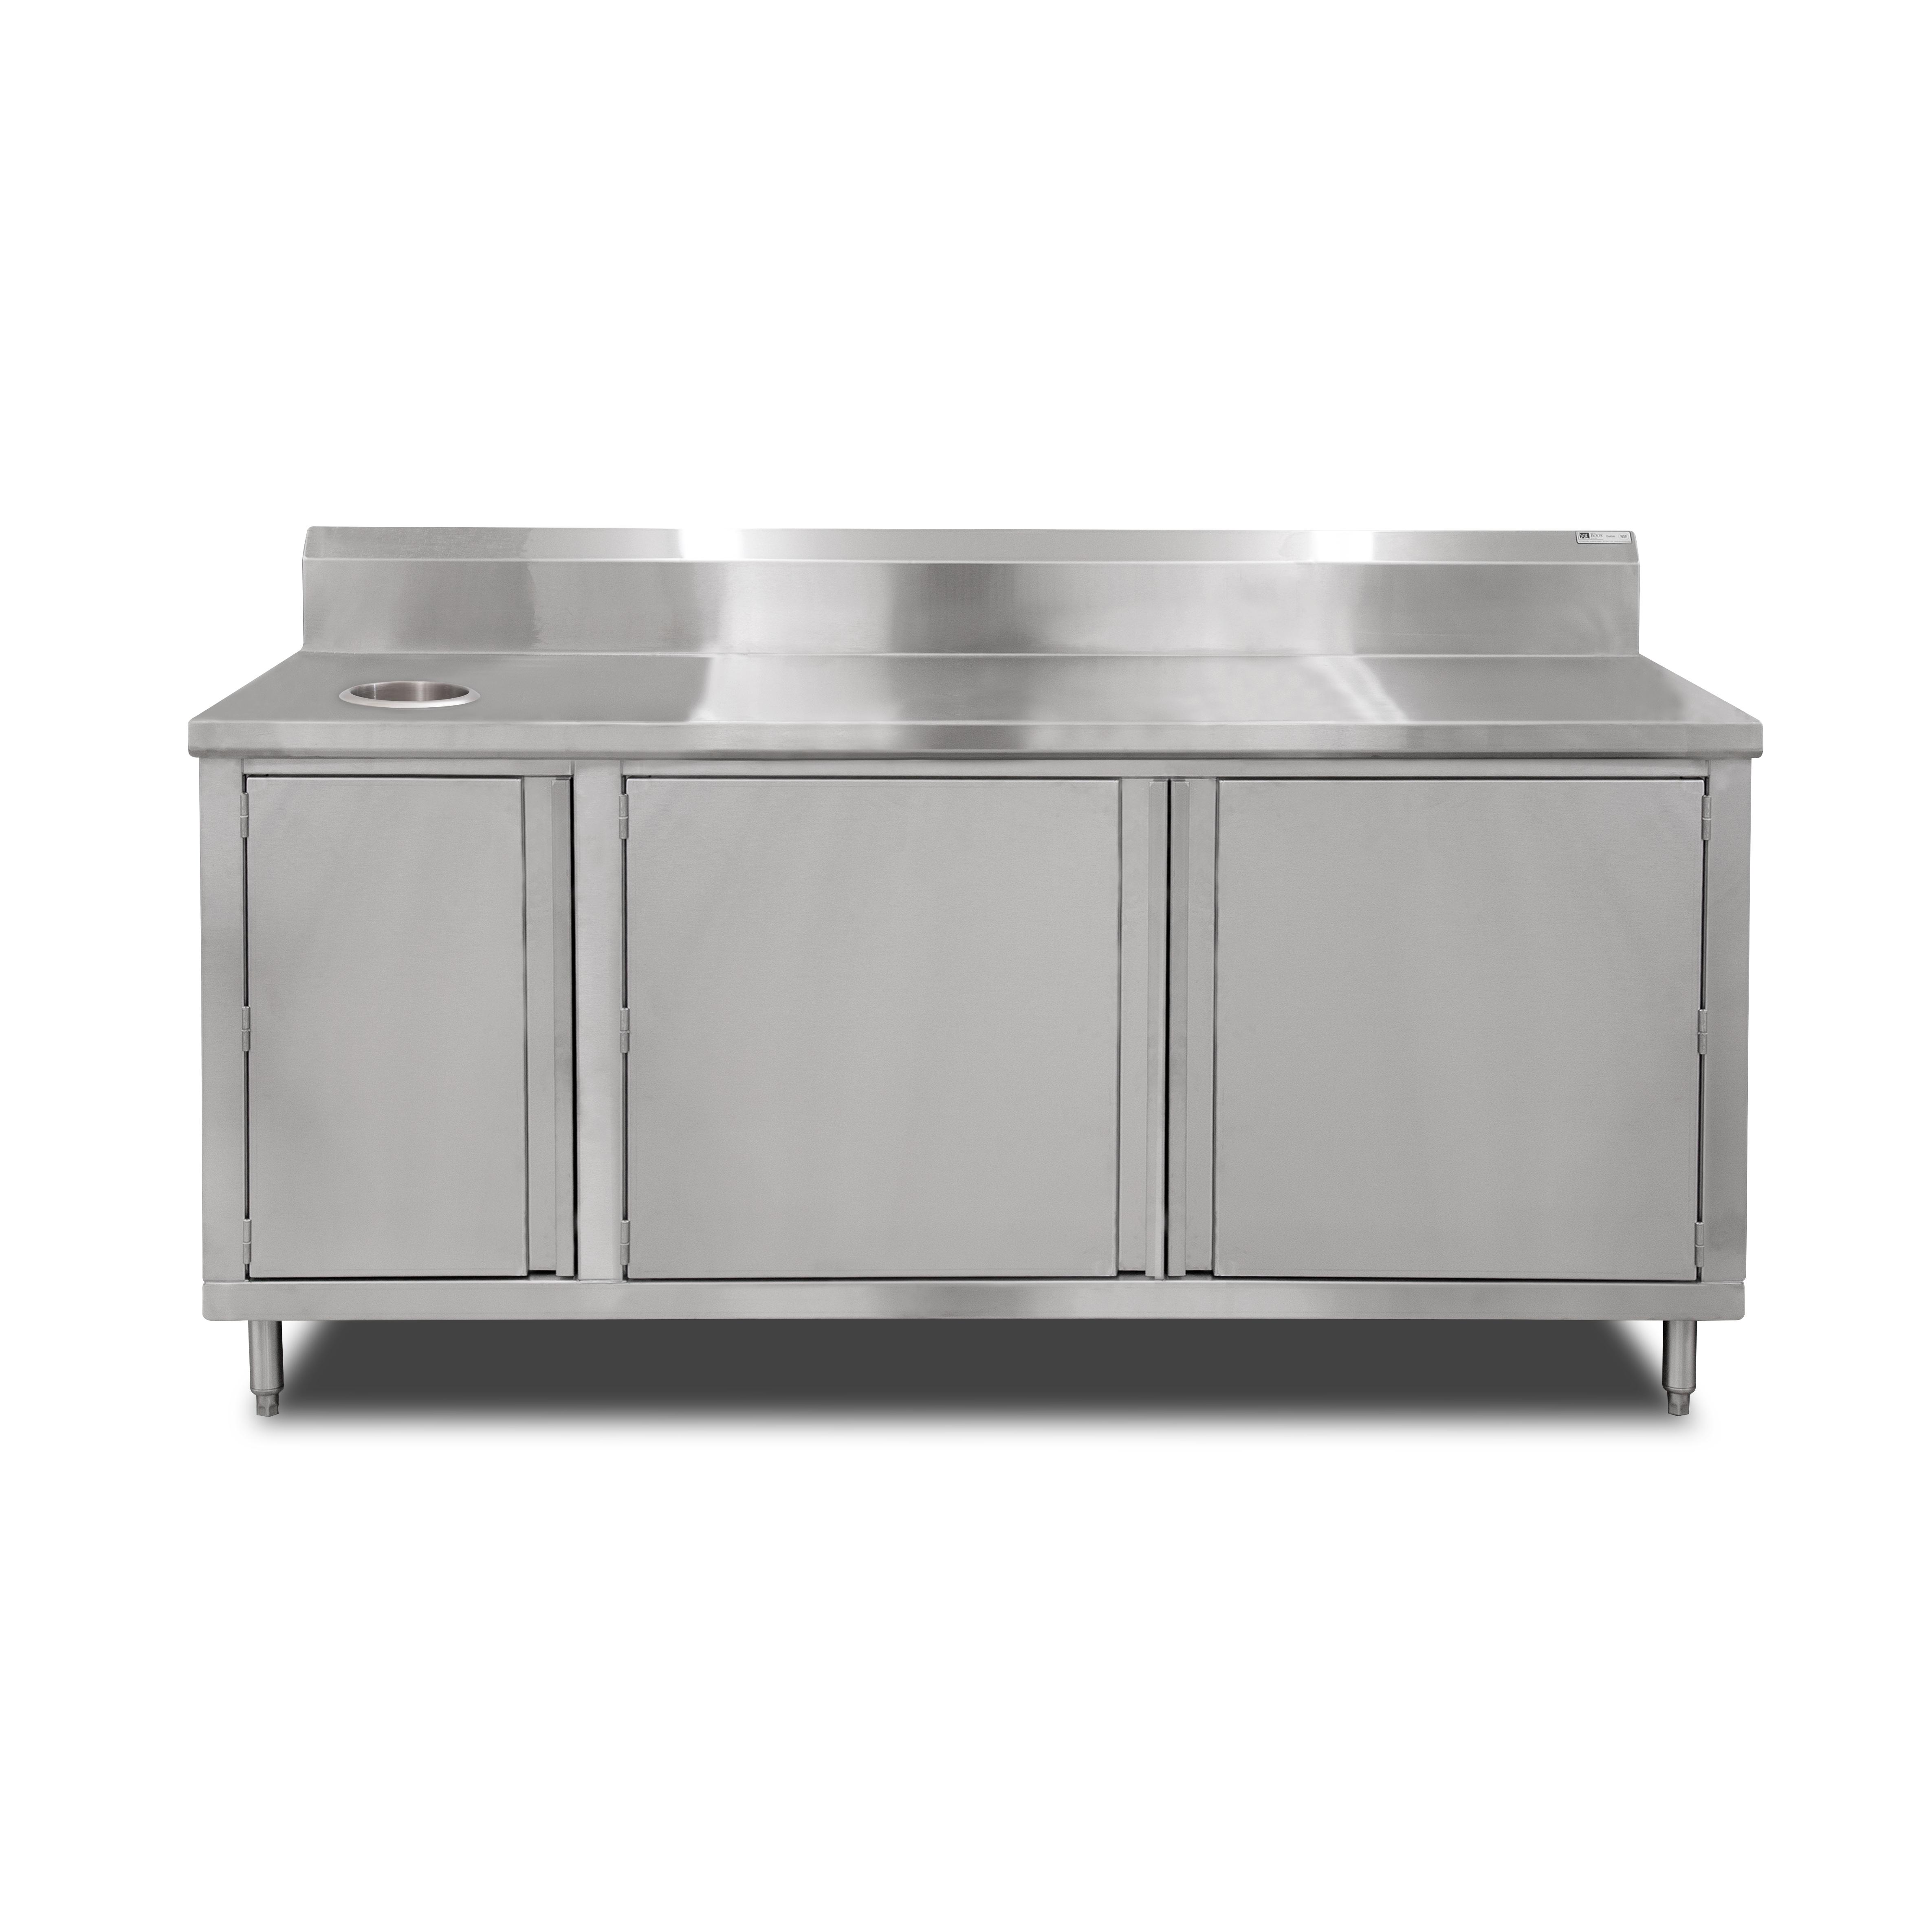 John Boos 4BU4R5-3660-R work table, cabinet base hinged doors